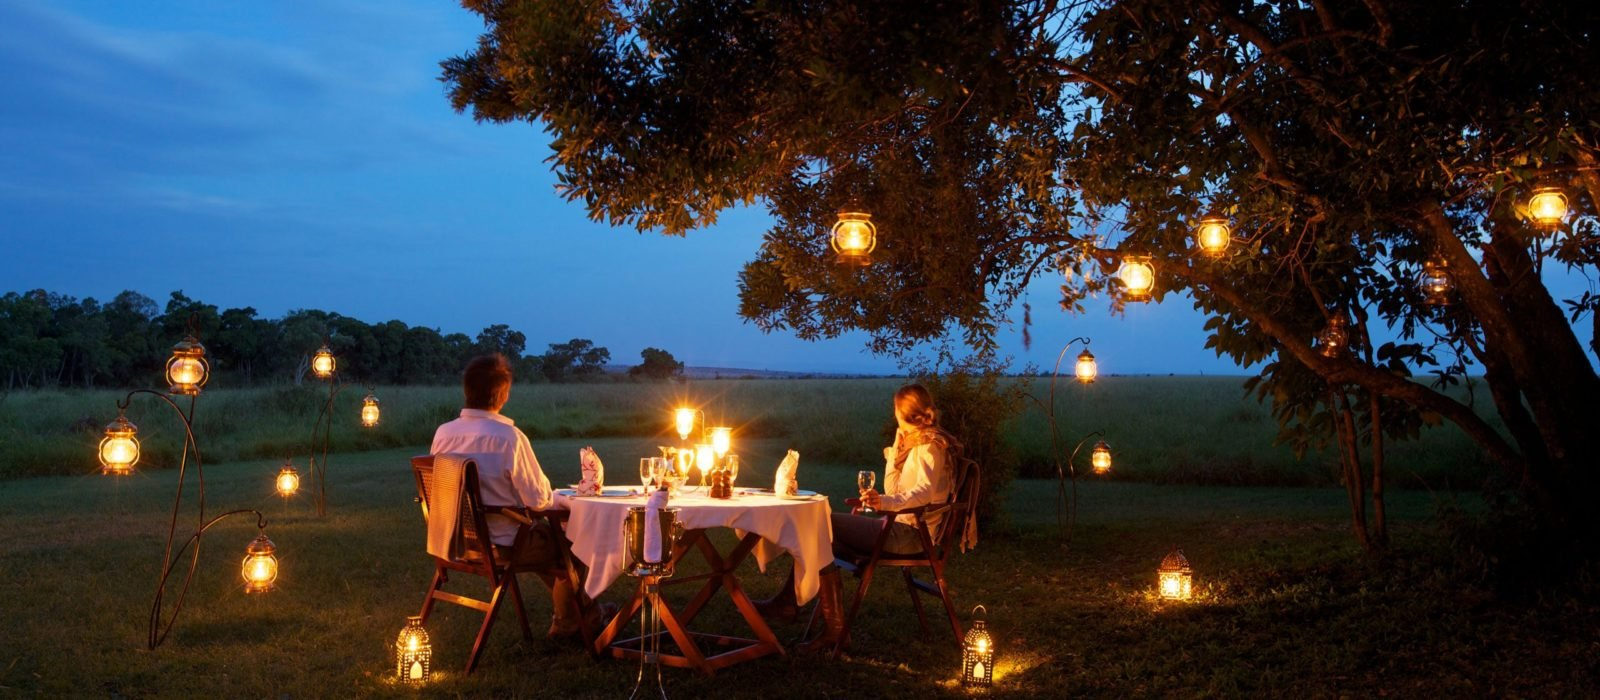 Romantic Candlelit Dinner